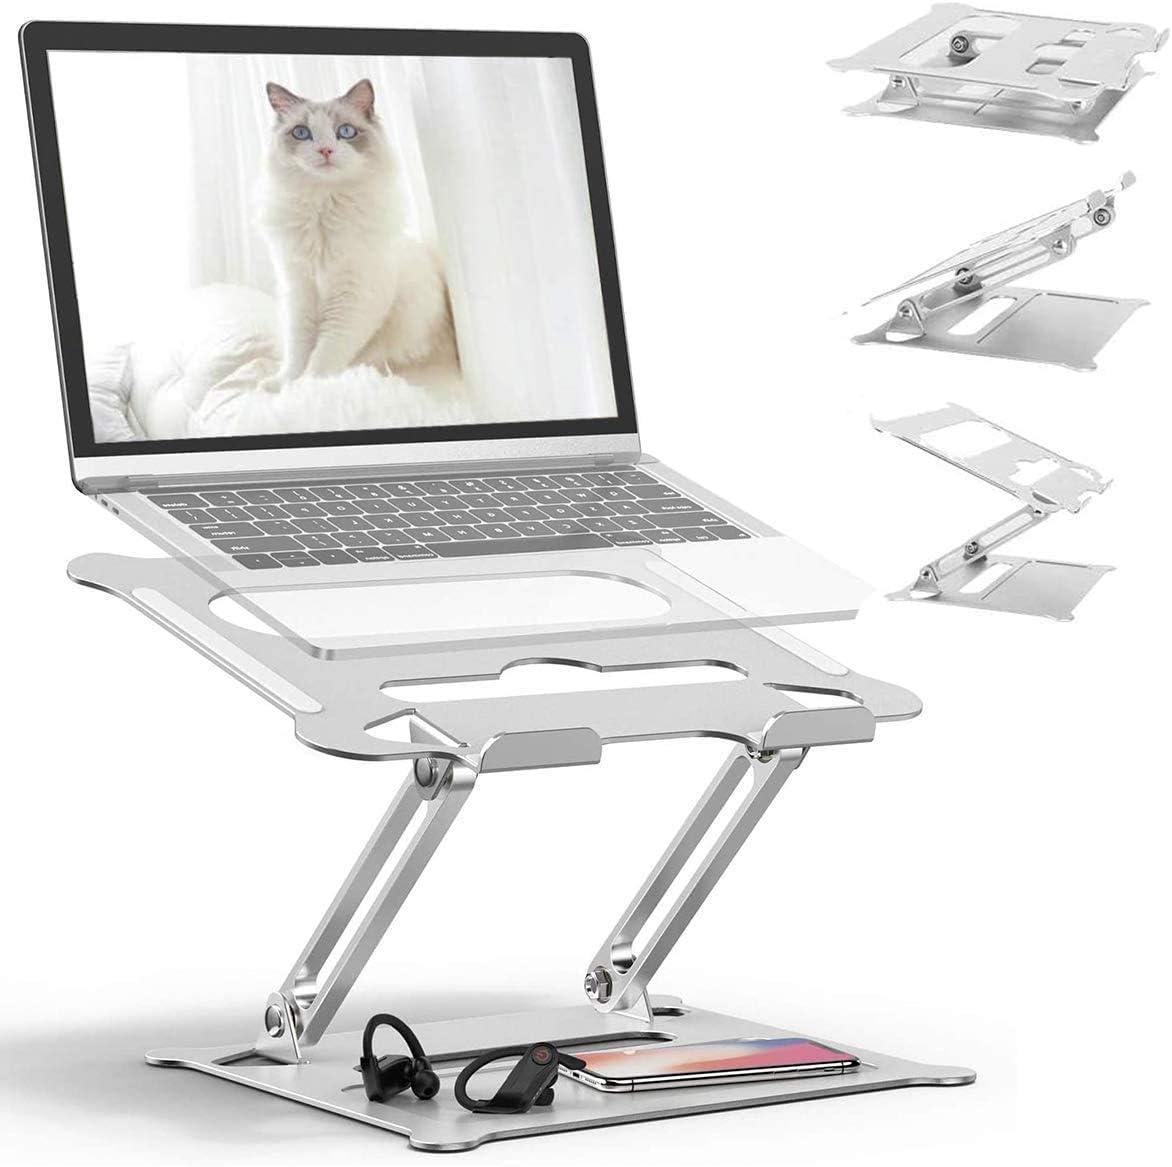 Laptop Table, Adjustable Great Laptop Bed Table, Portable Laptop Workstation Notebook Stand Reading Holder,Ergonomic Lap Desk TV Bed Tray Standing Desk